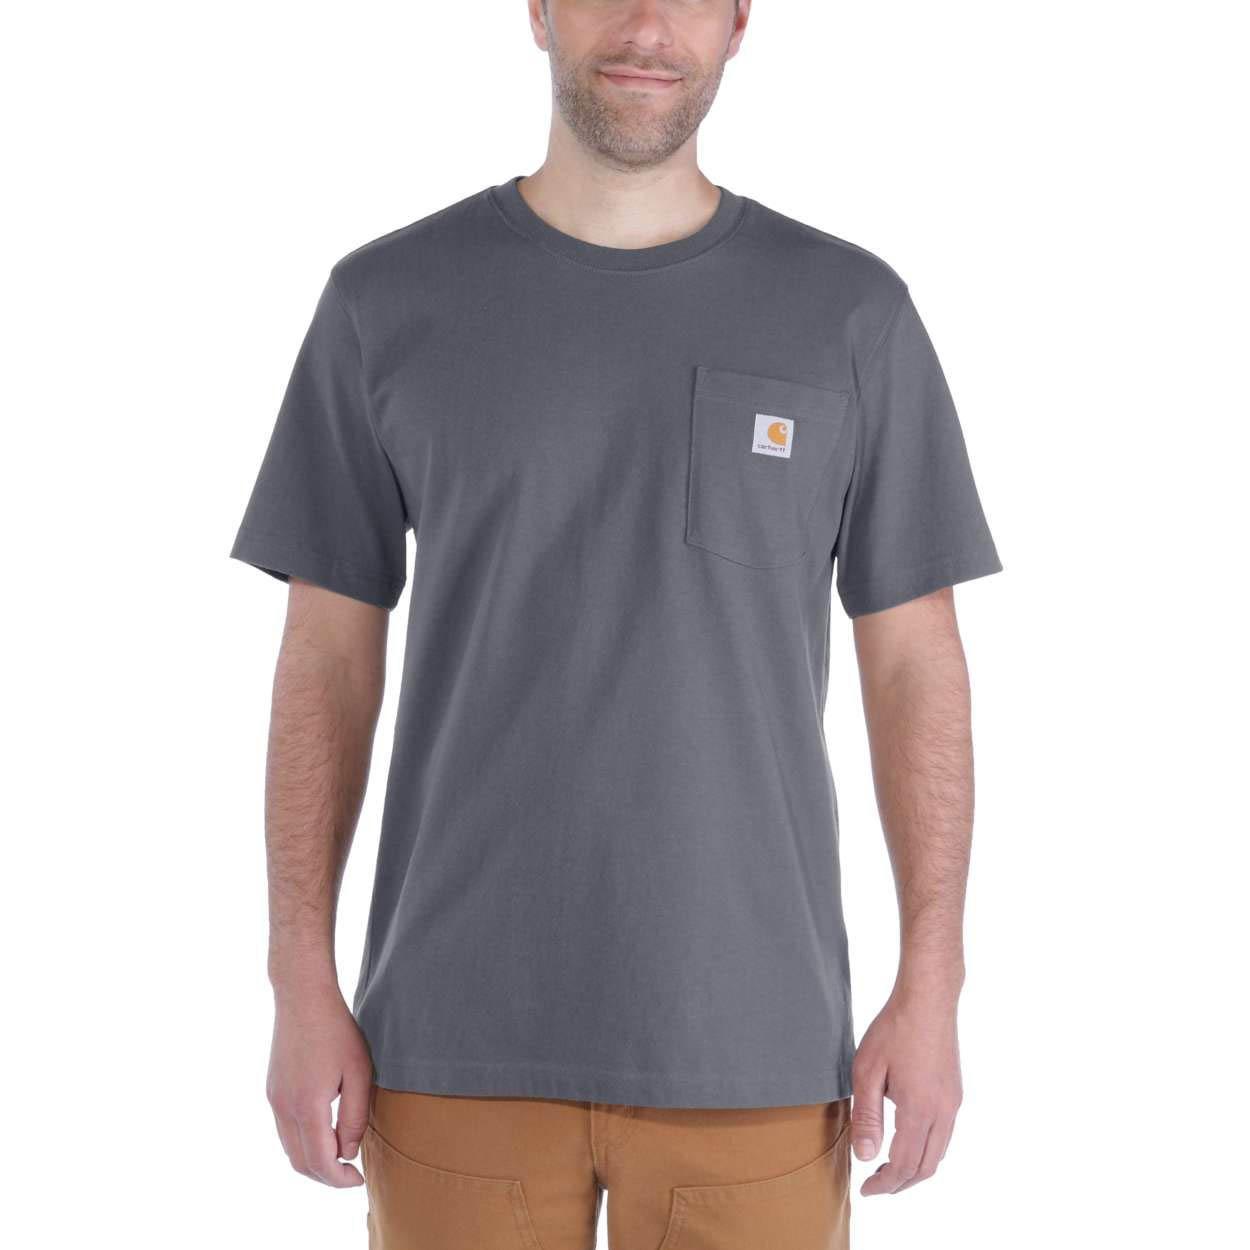 a70d8f1987 Carhartt 103296 Workwear Pocket T-Shirt S/S - Workwear Polo Shirts ...